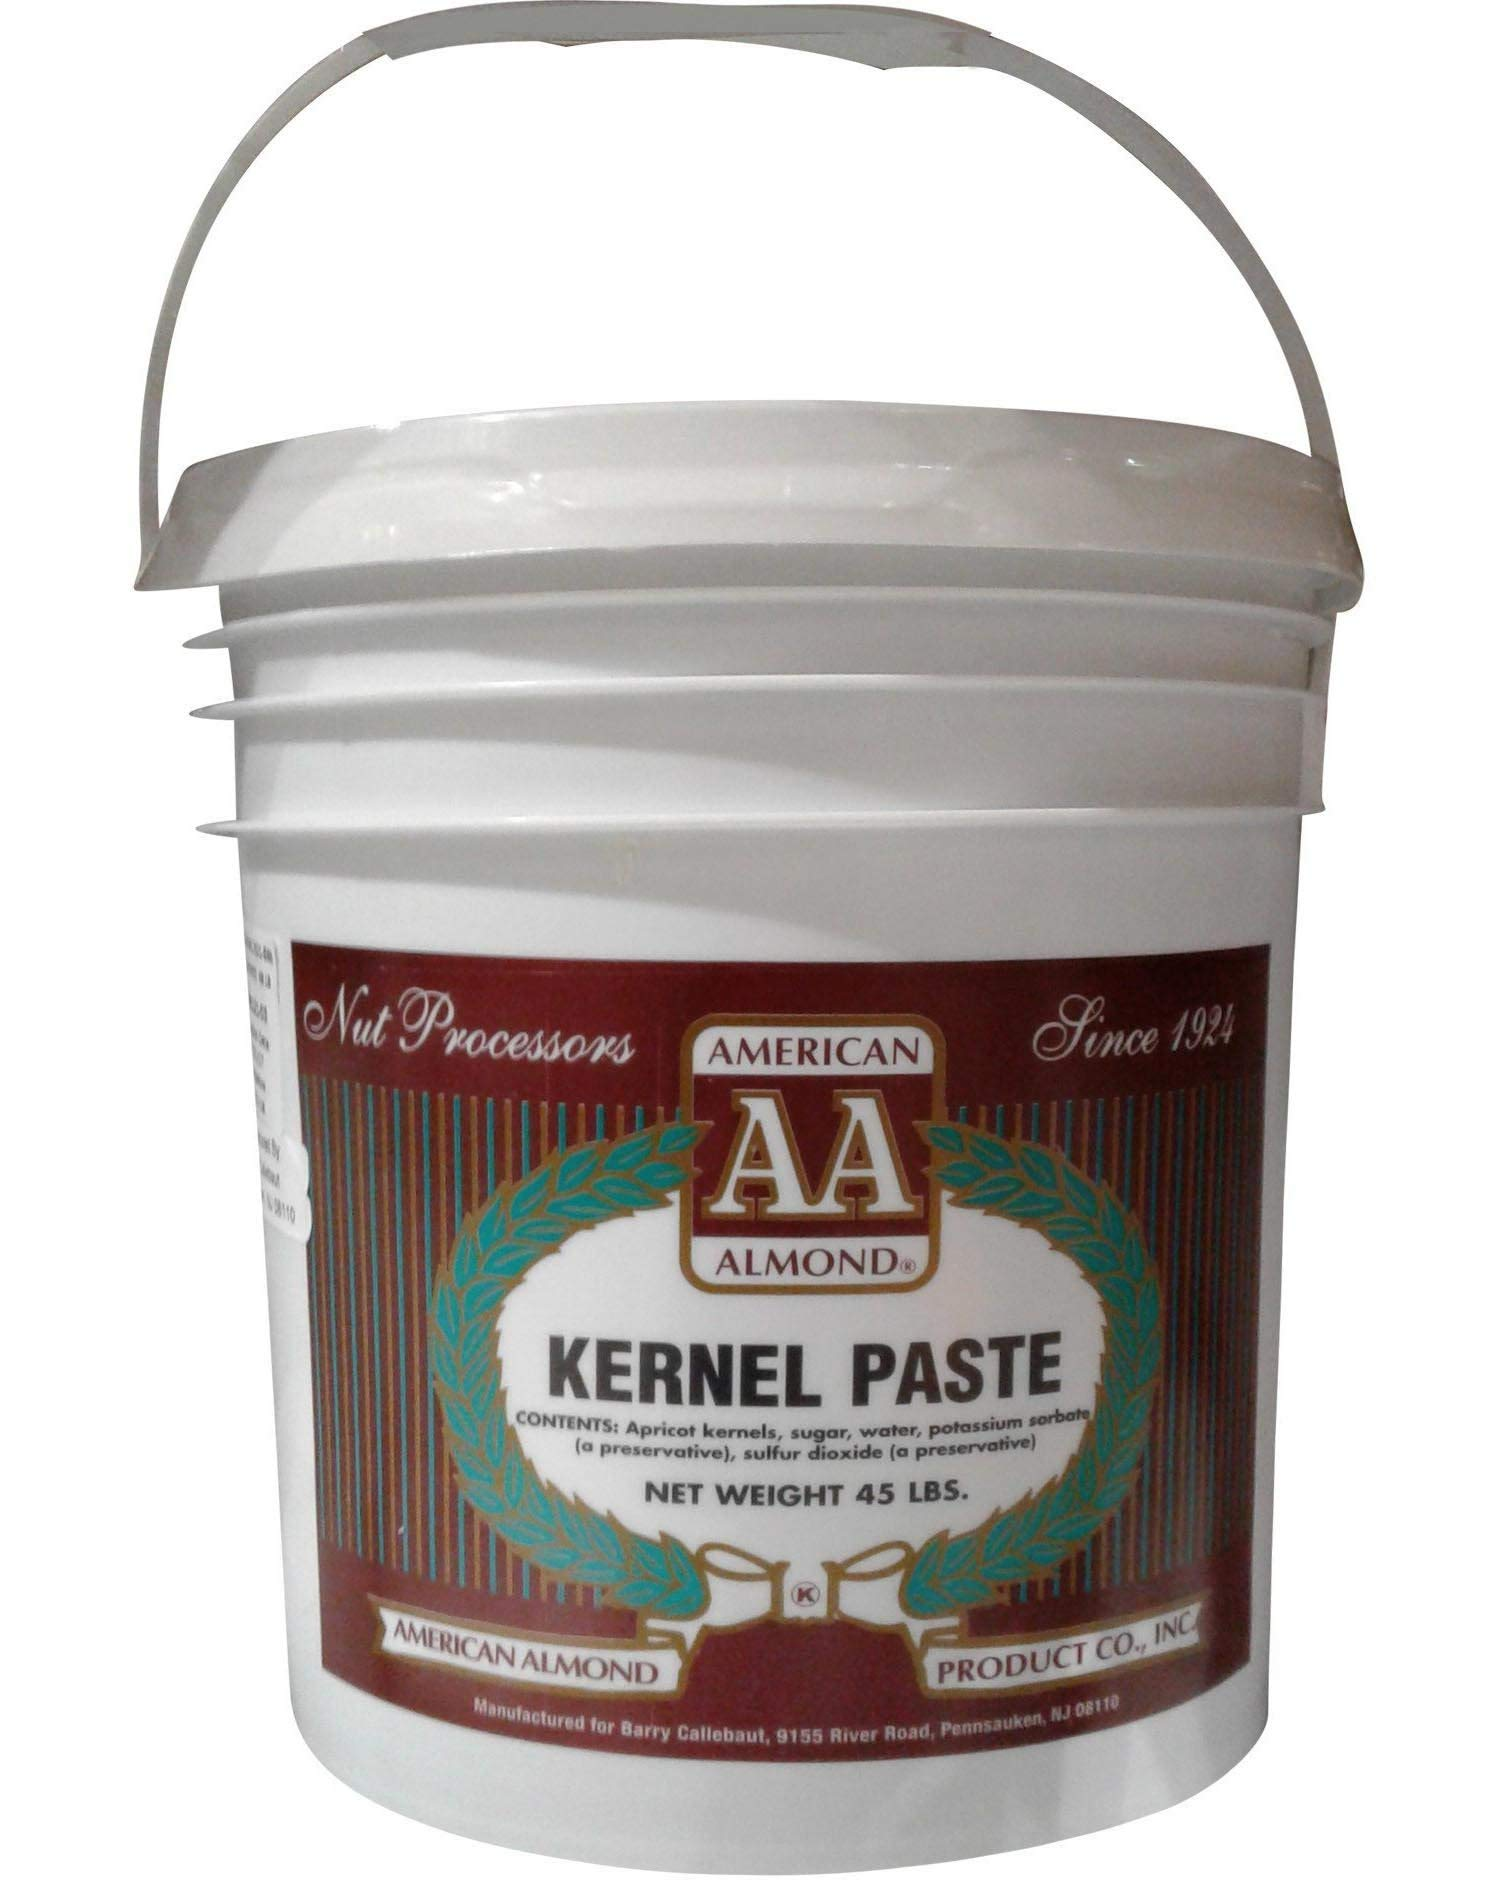 American Almond Kernel Paste - 45 lb Tub by American Almond (Image #1)